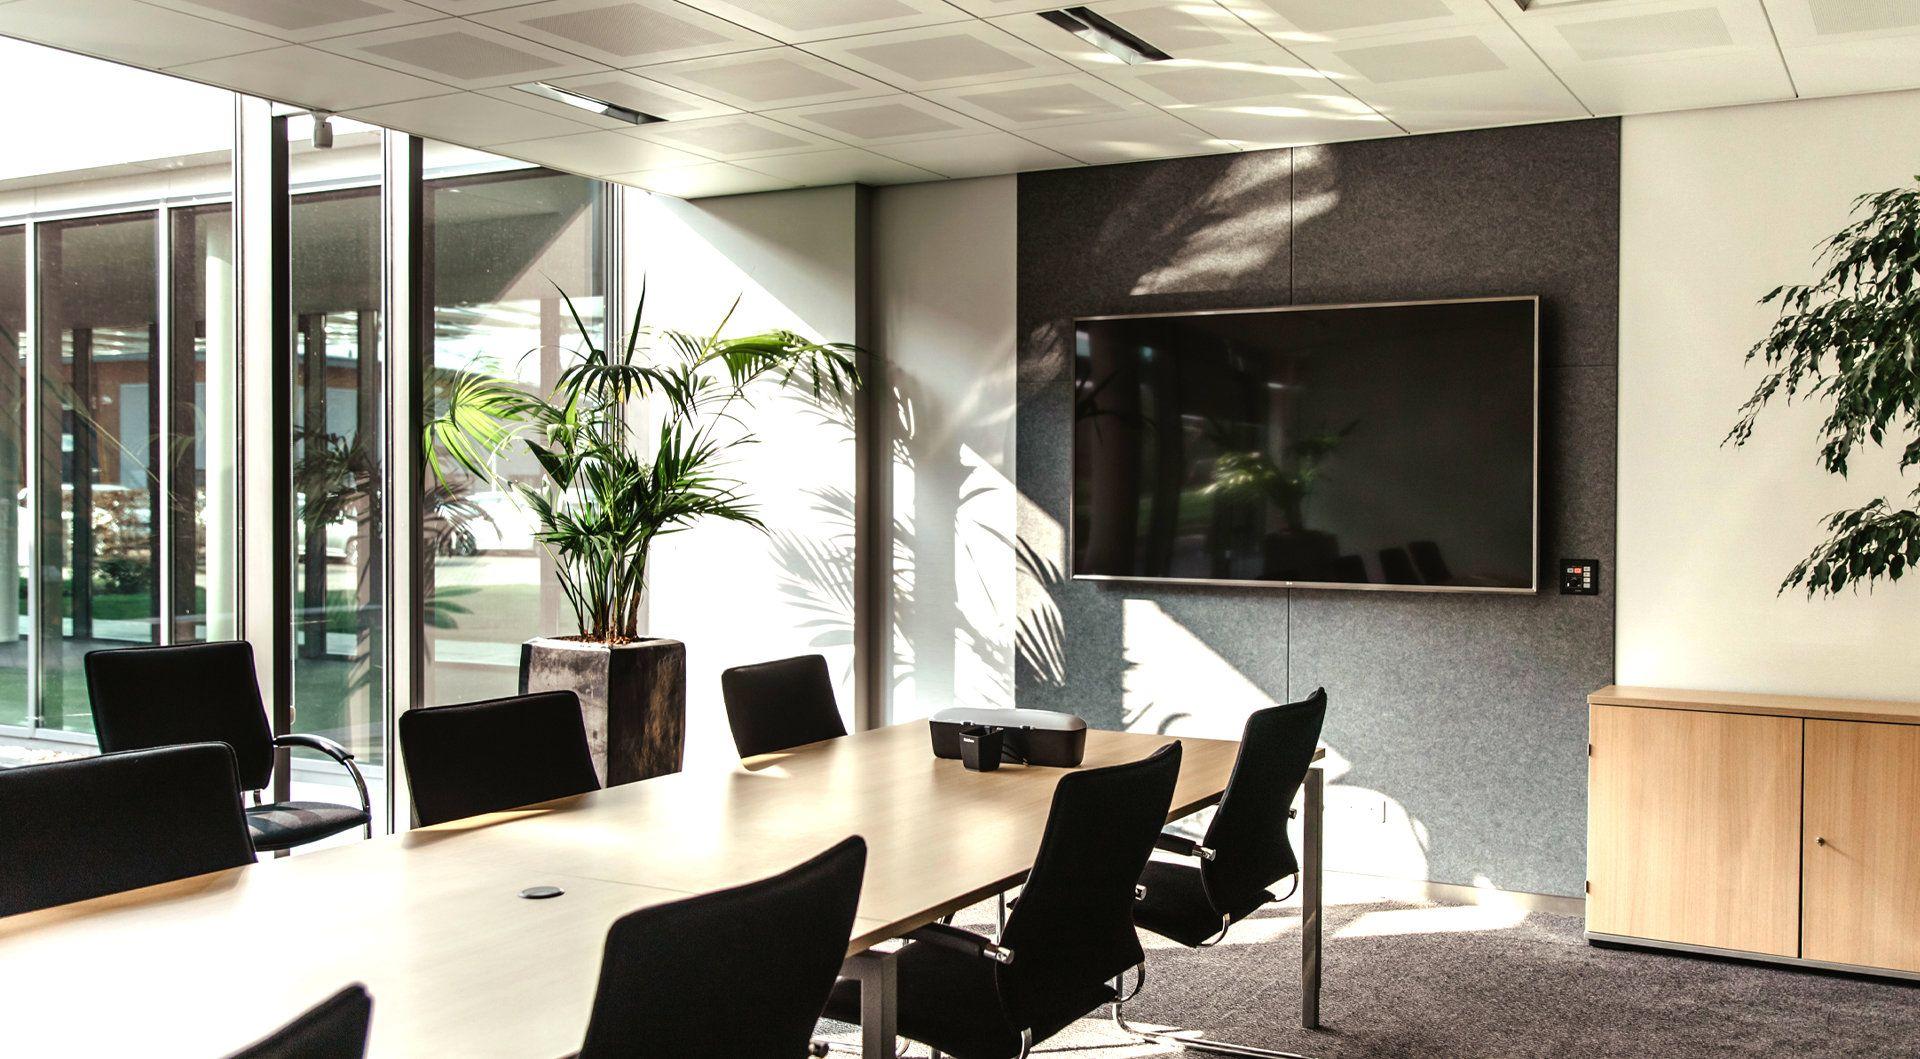 "LG 86TR3BF beeldkrant 2,18 m (86"") LED 4K Ultra HD Touchscreen Interactief flatscreen Zwart - Case studie de vries"